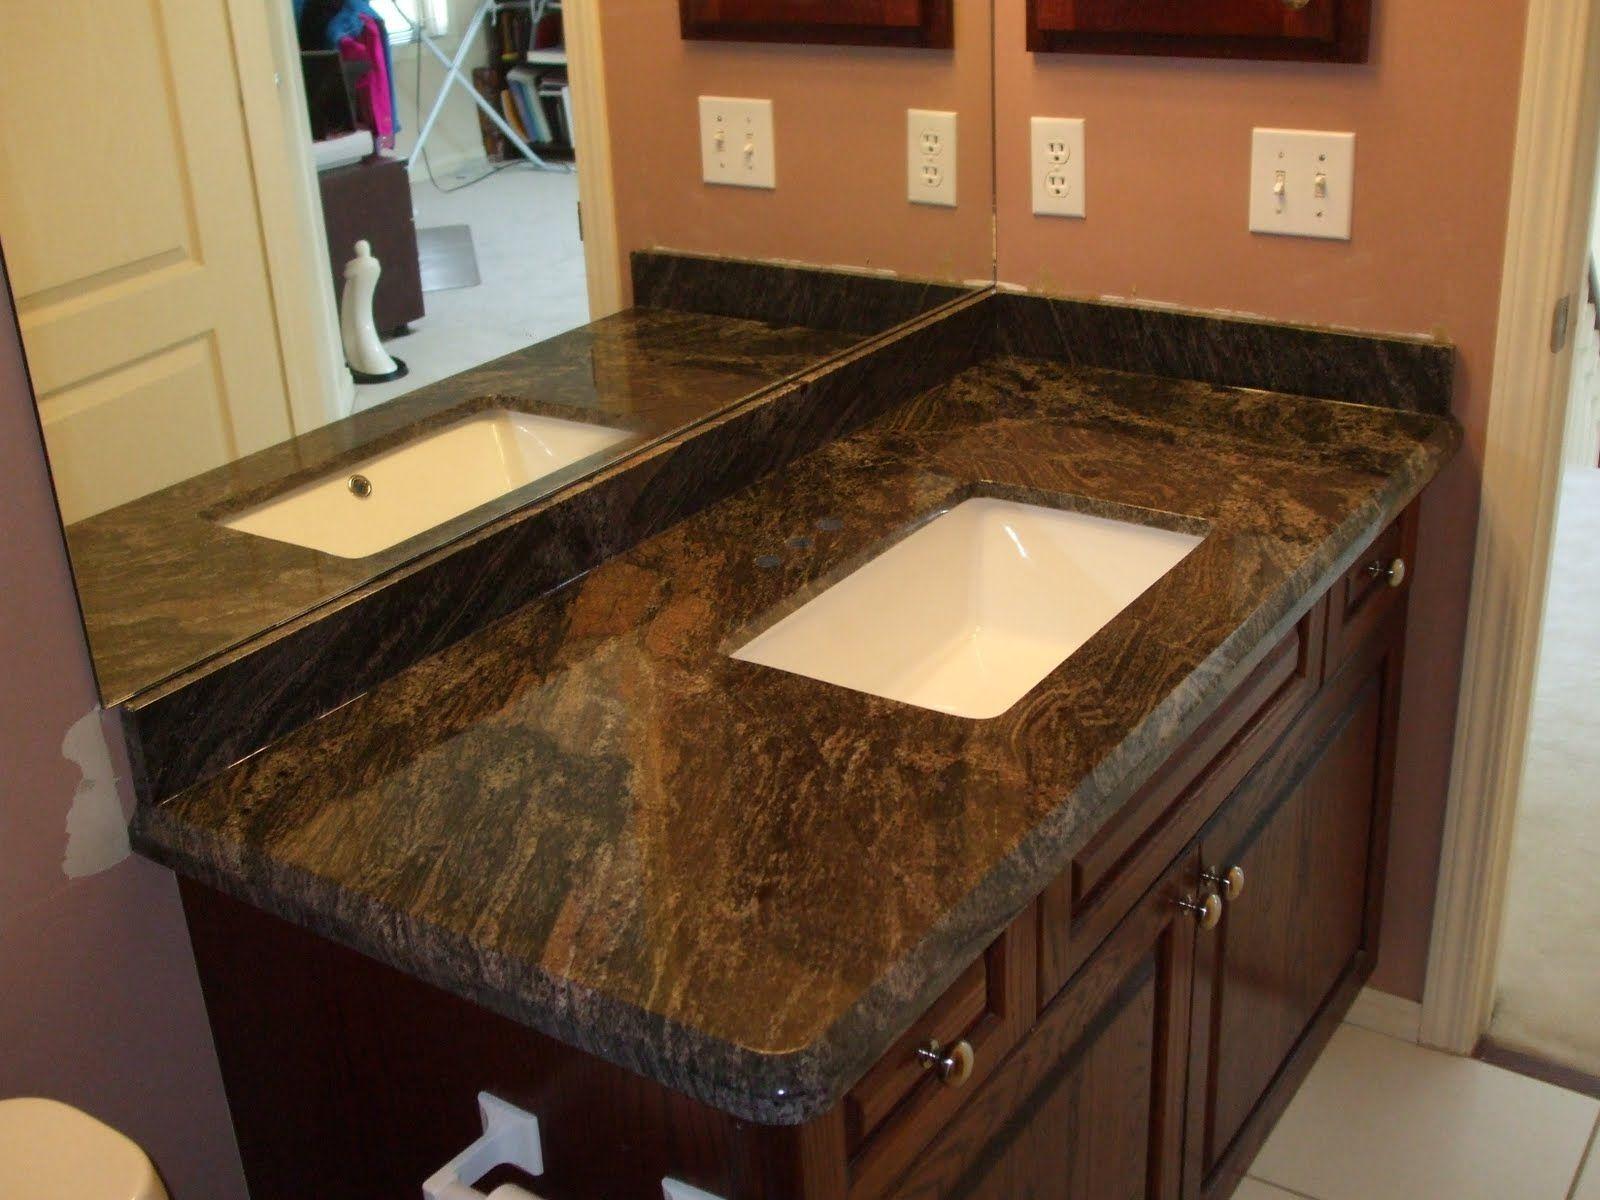 camdencrunch kitchen tile countertops price kitchens club granite with countertop